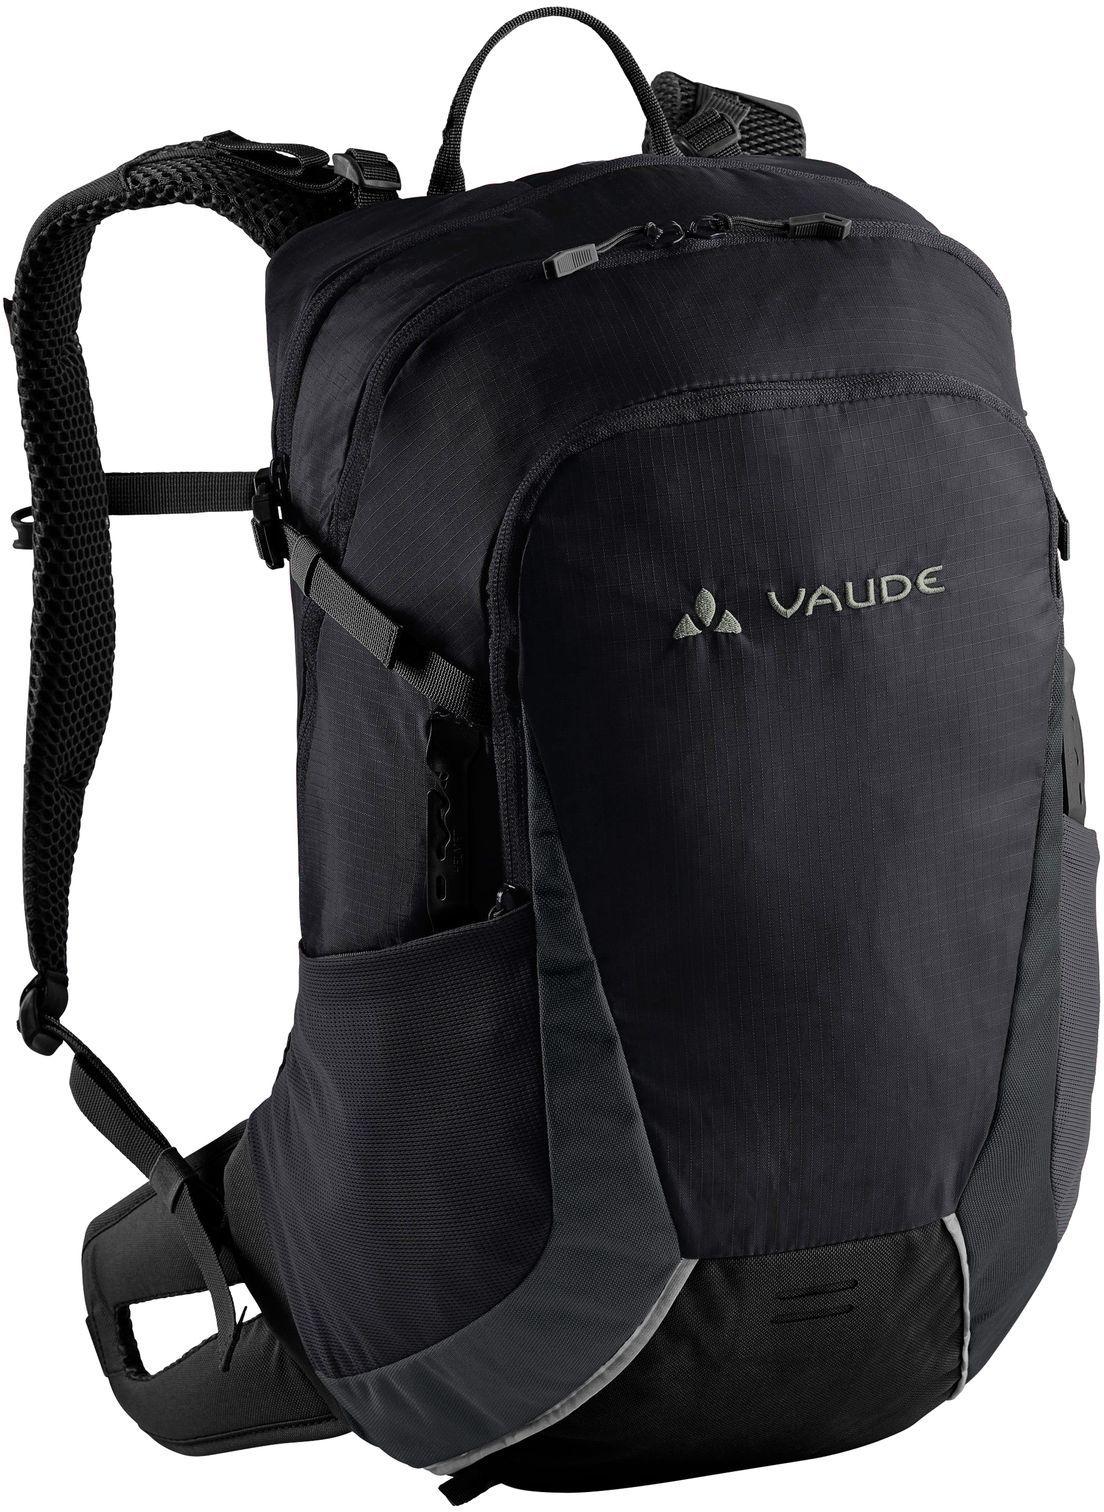 Vaude Tremalzo 16 - black uni